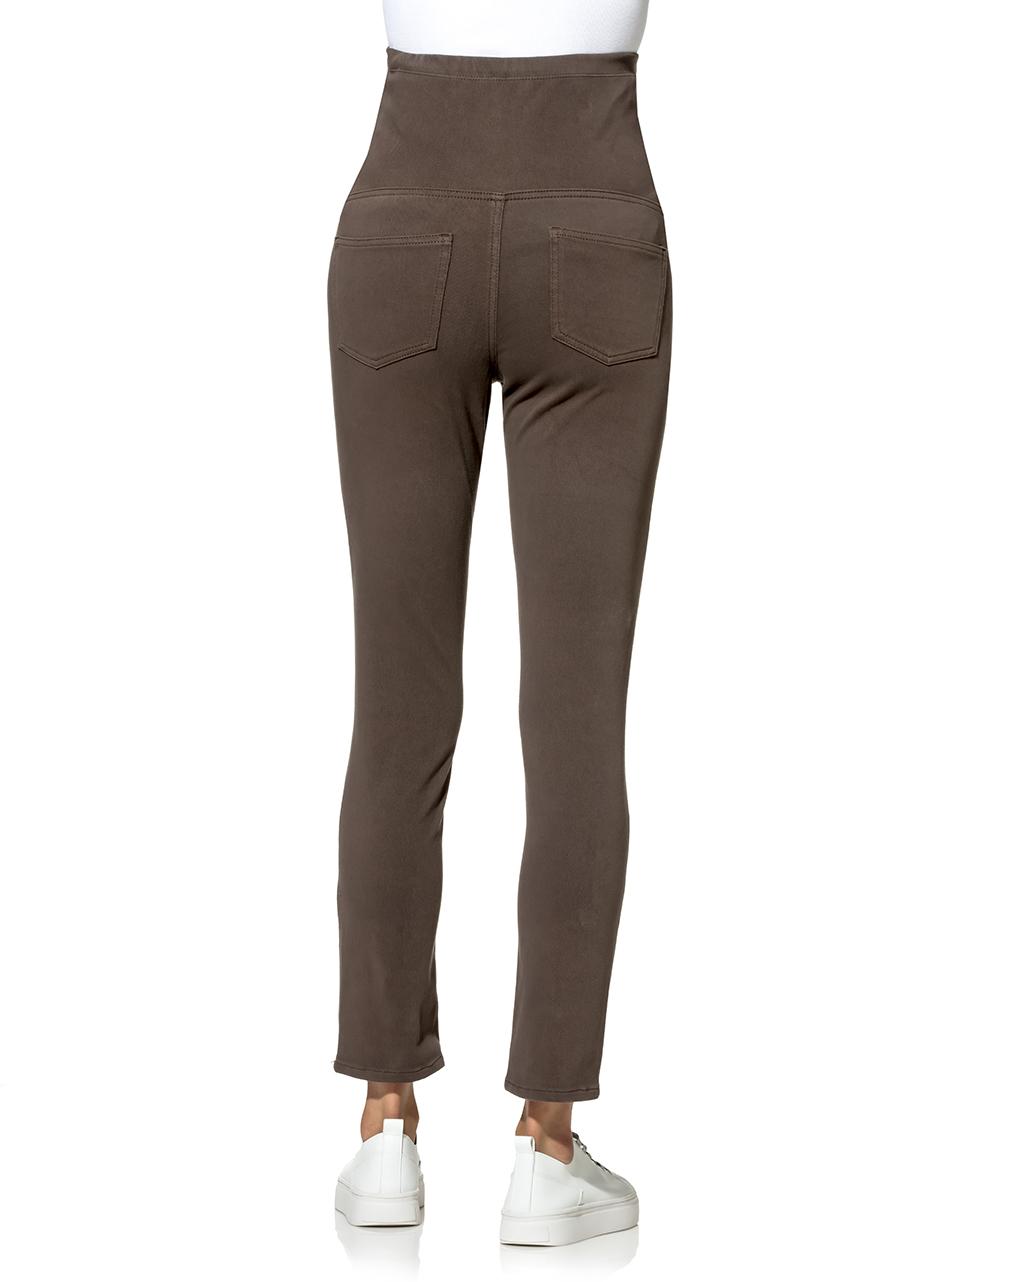 Pantalone in twill elastico - Prénatal